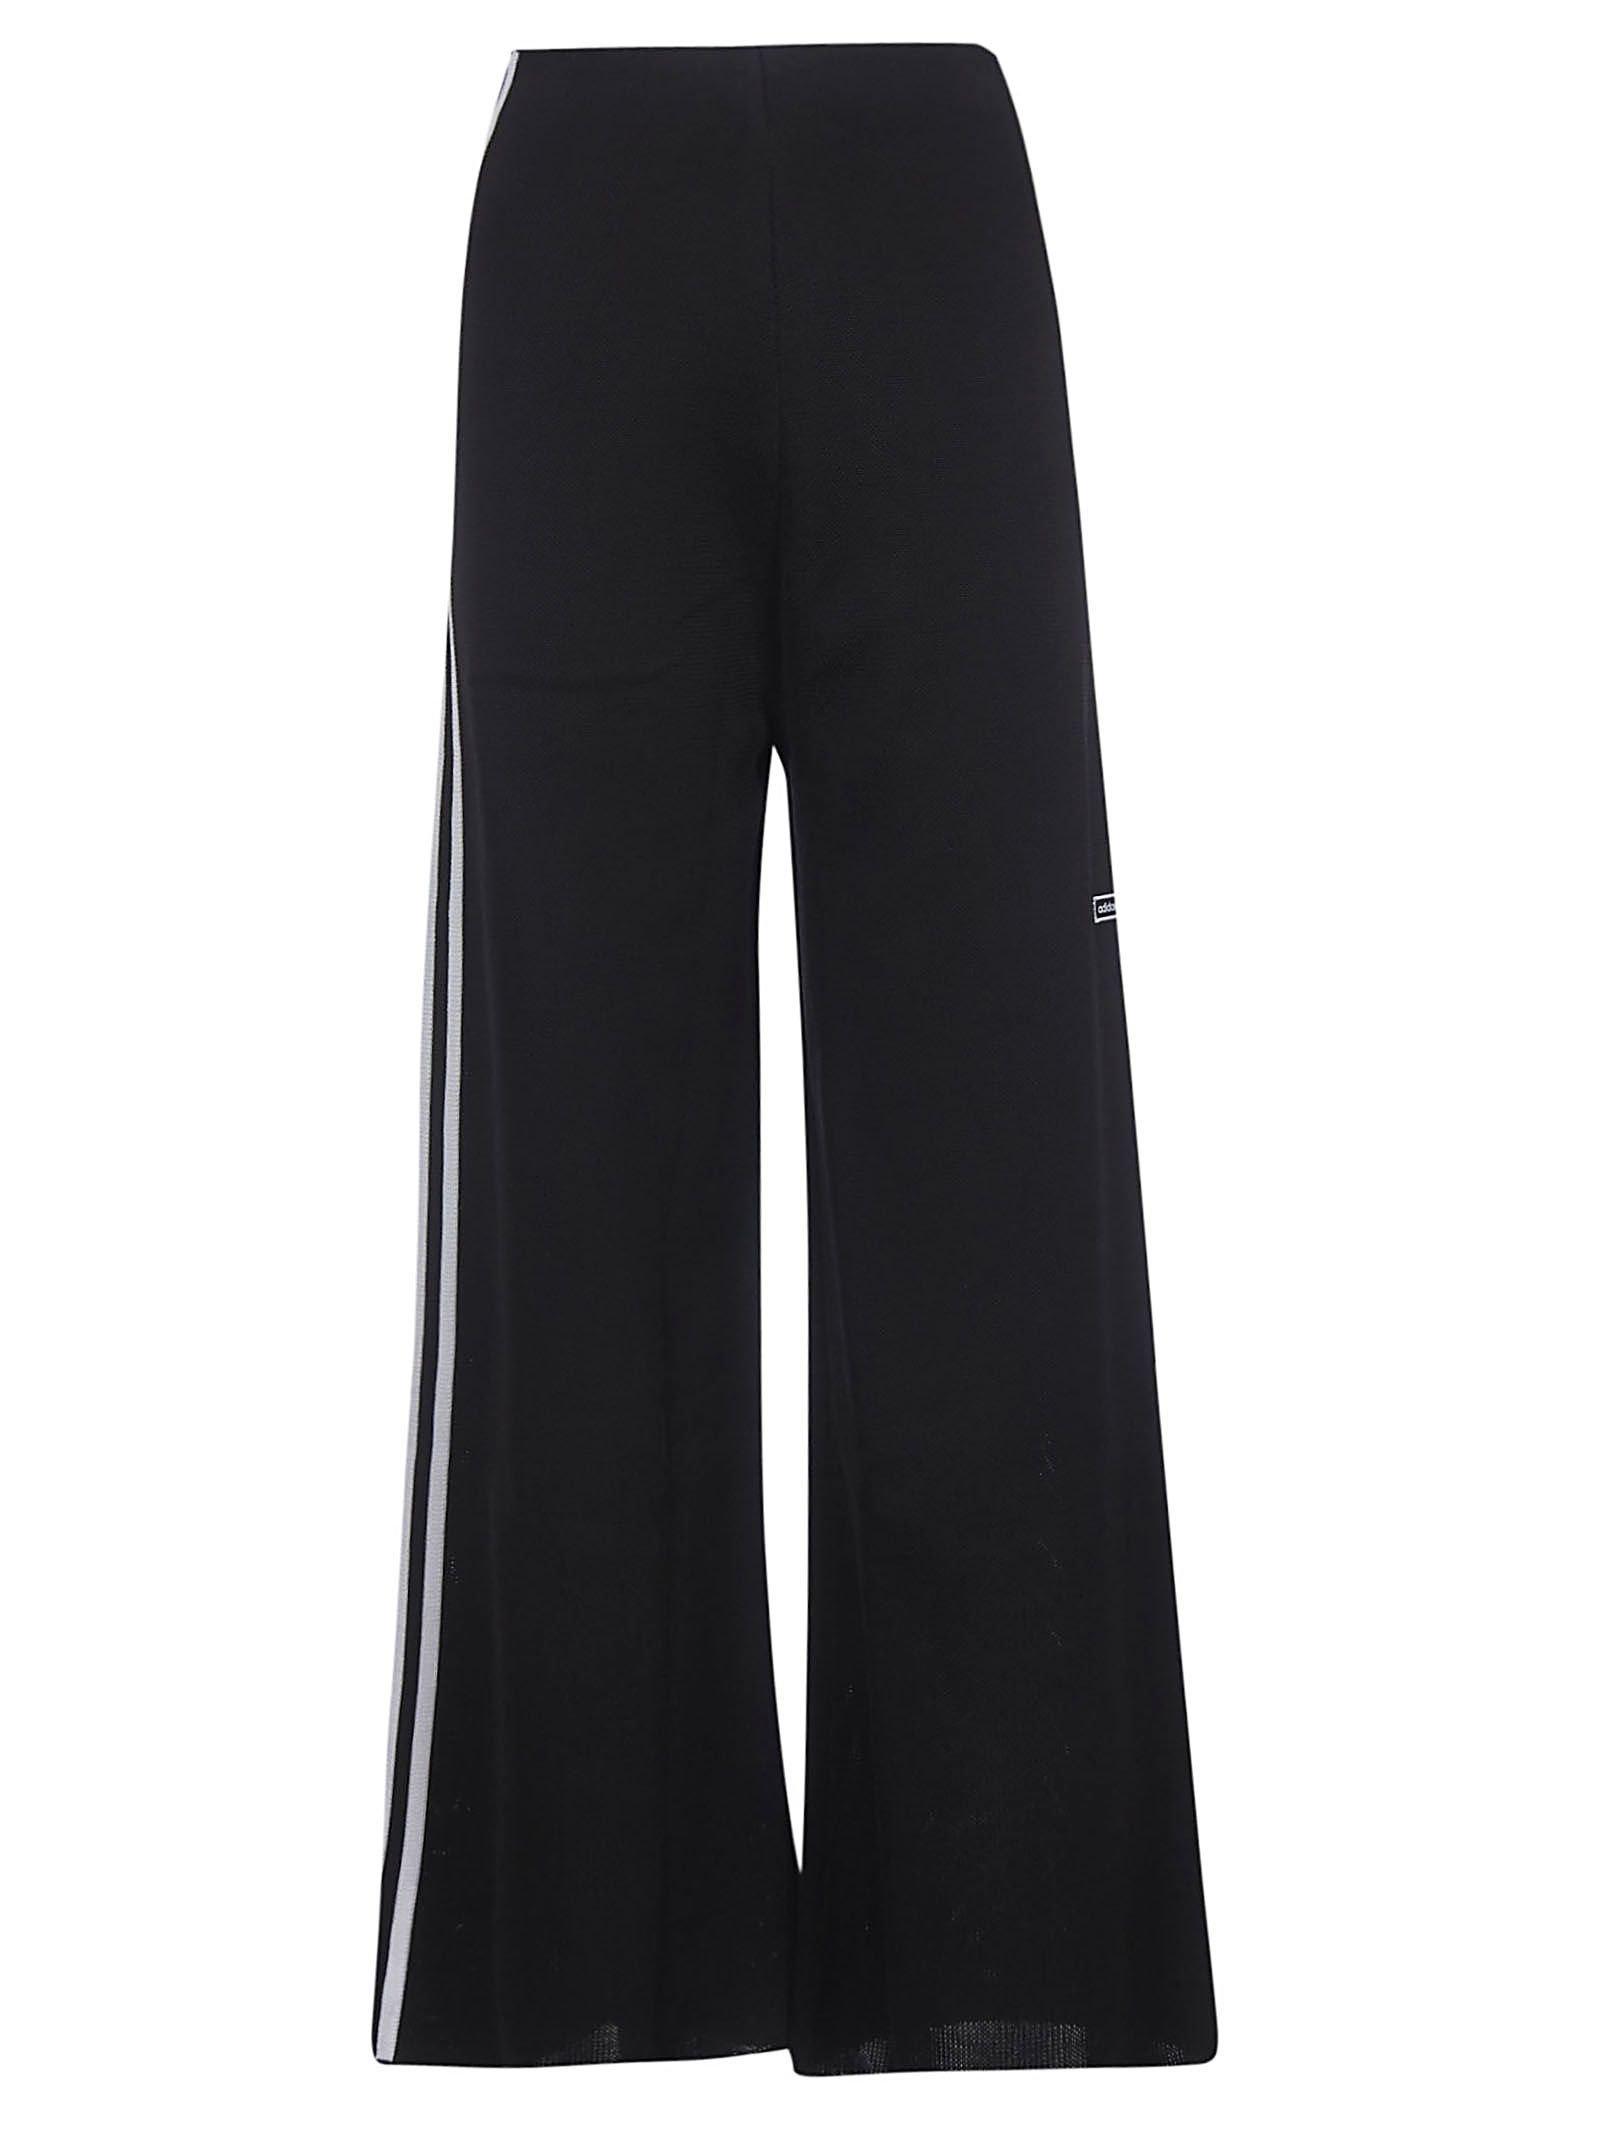 Adidas Wide Leg Track Pants